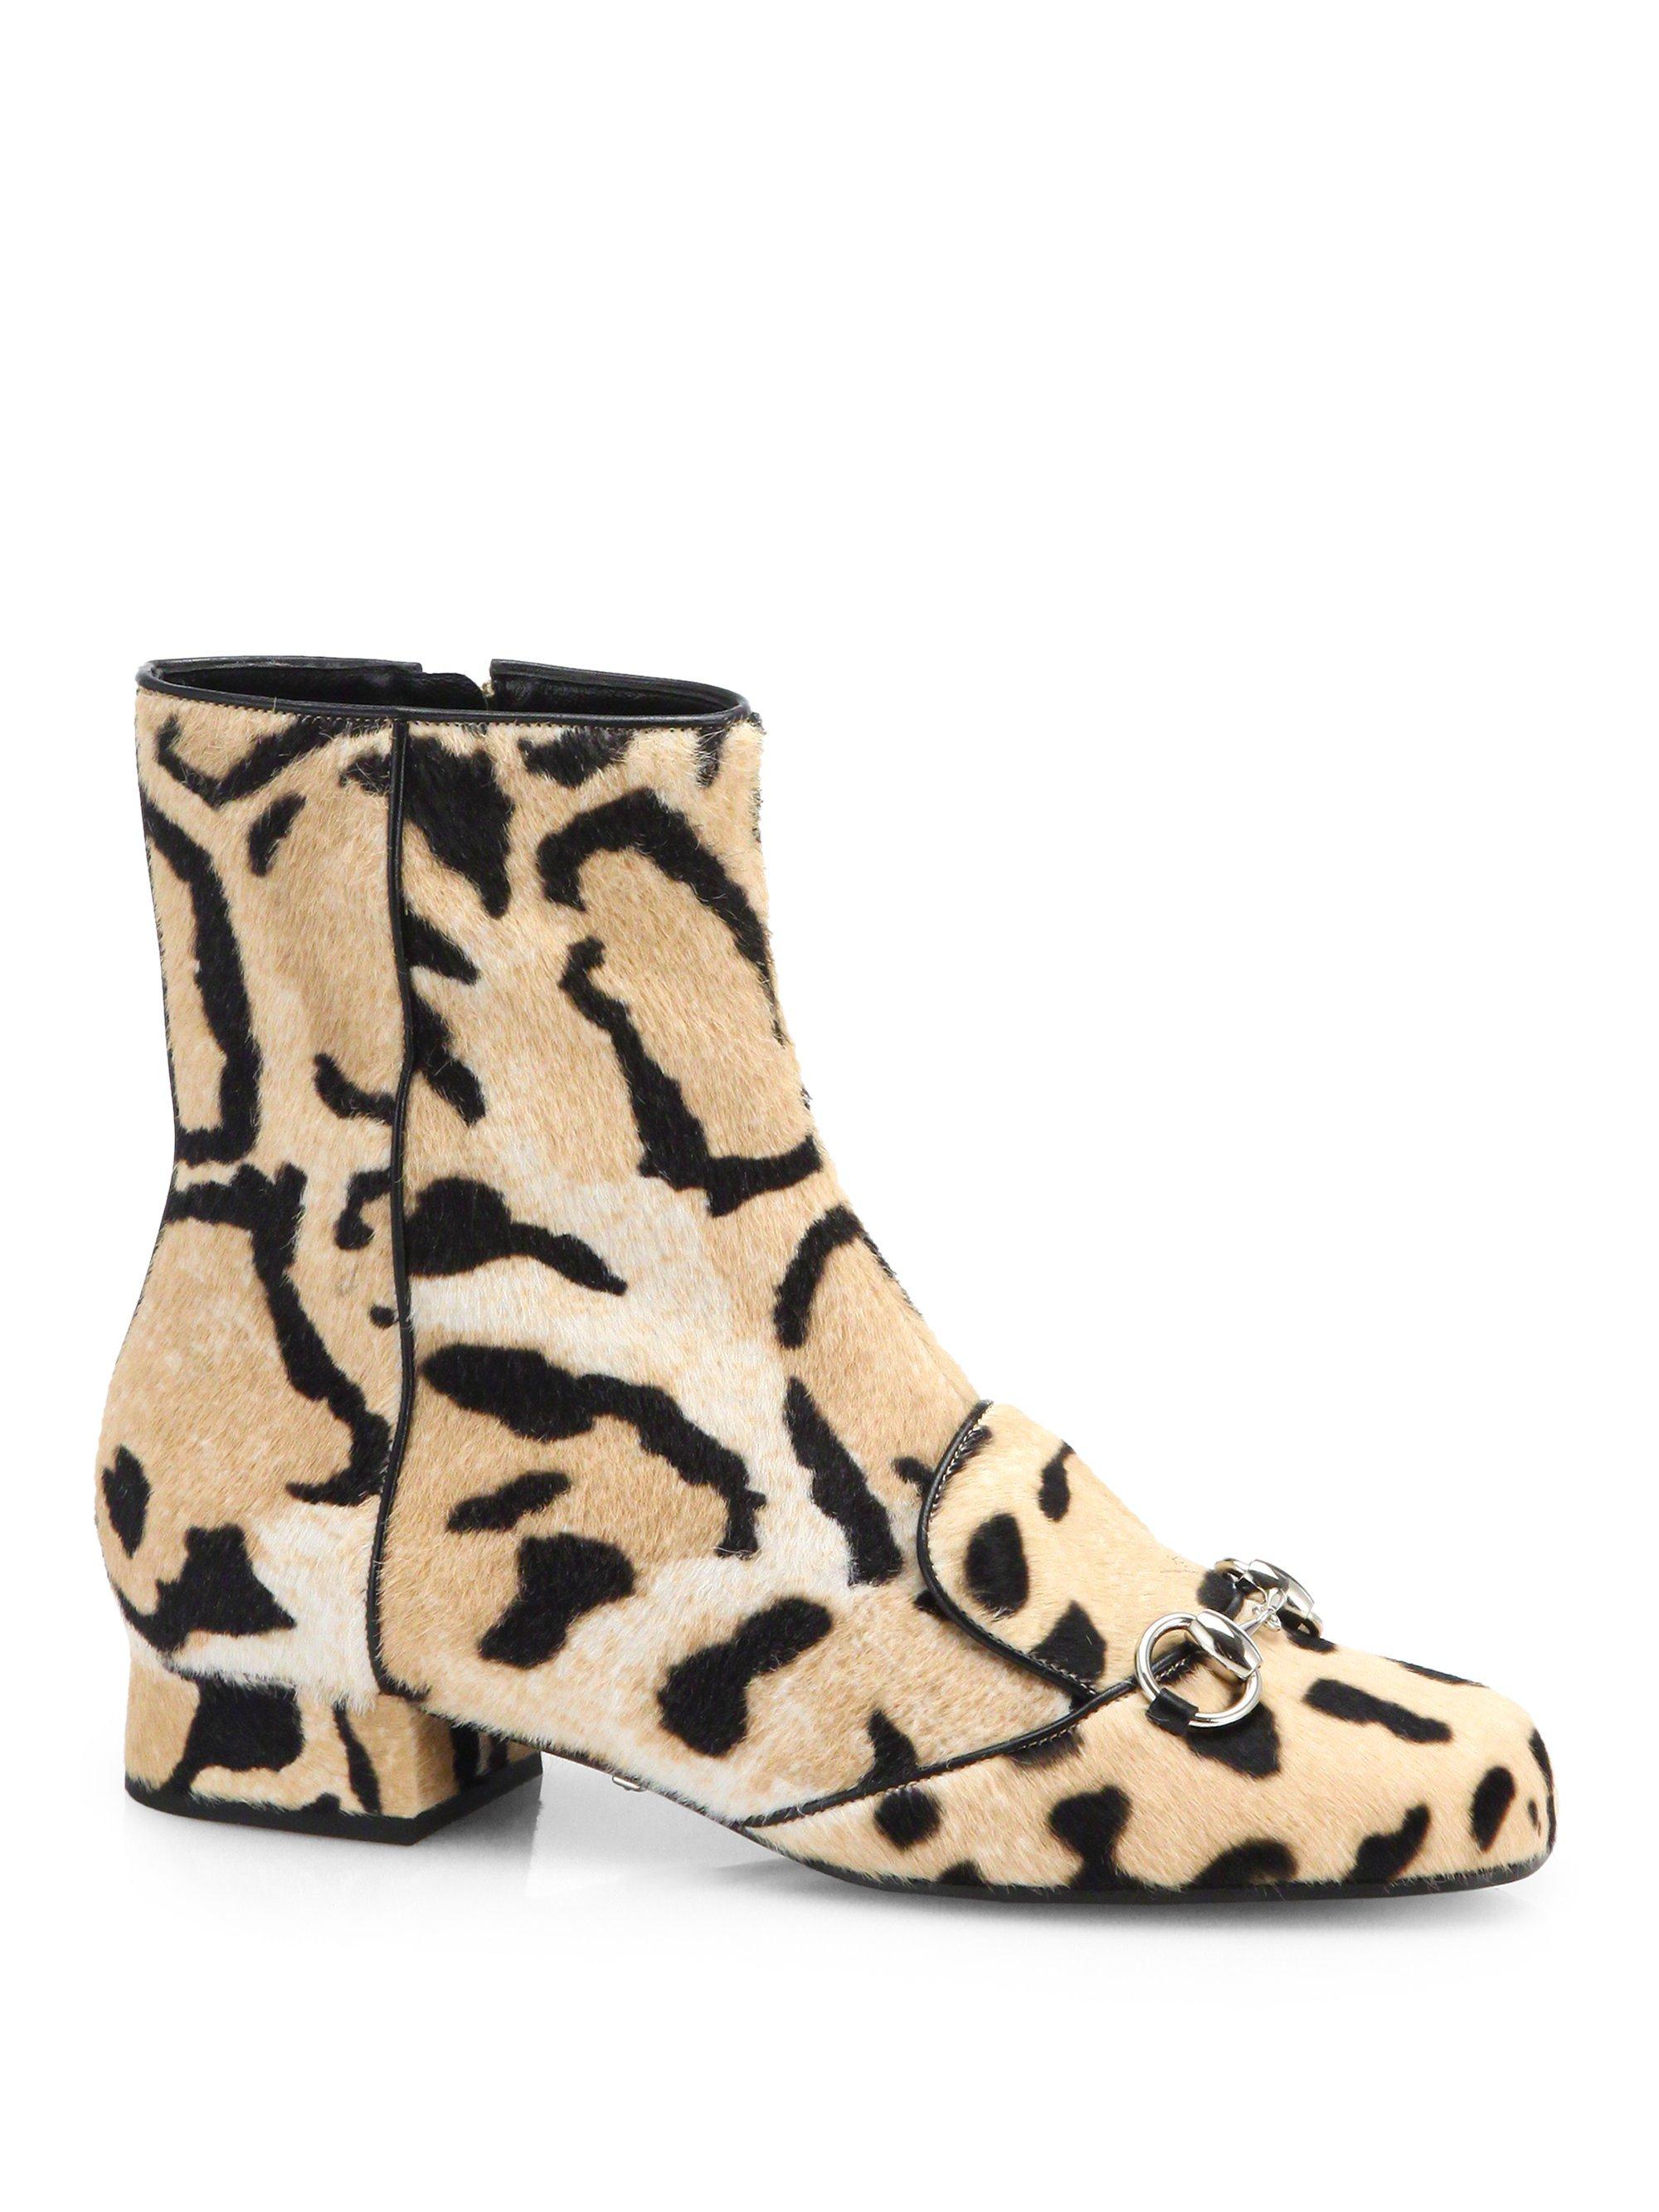 0b75c9454365 Gucci Lillian Horsebit Leopard Calf Hair Ankle Boots - Lyst